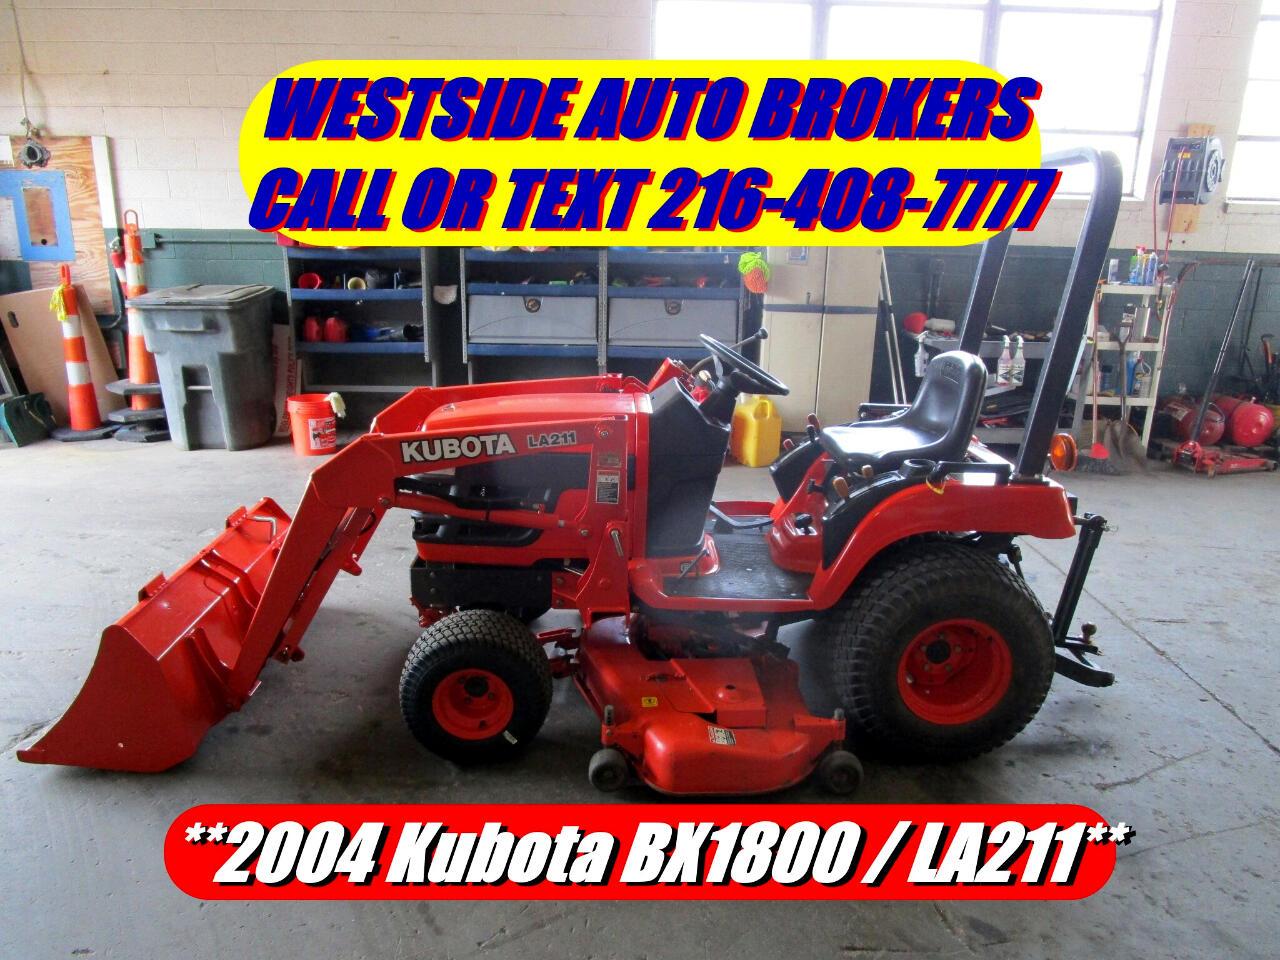 2004 Kubota Industrial LA211